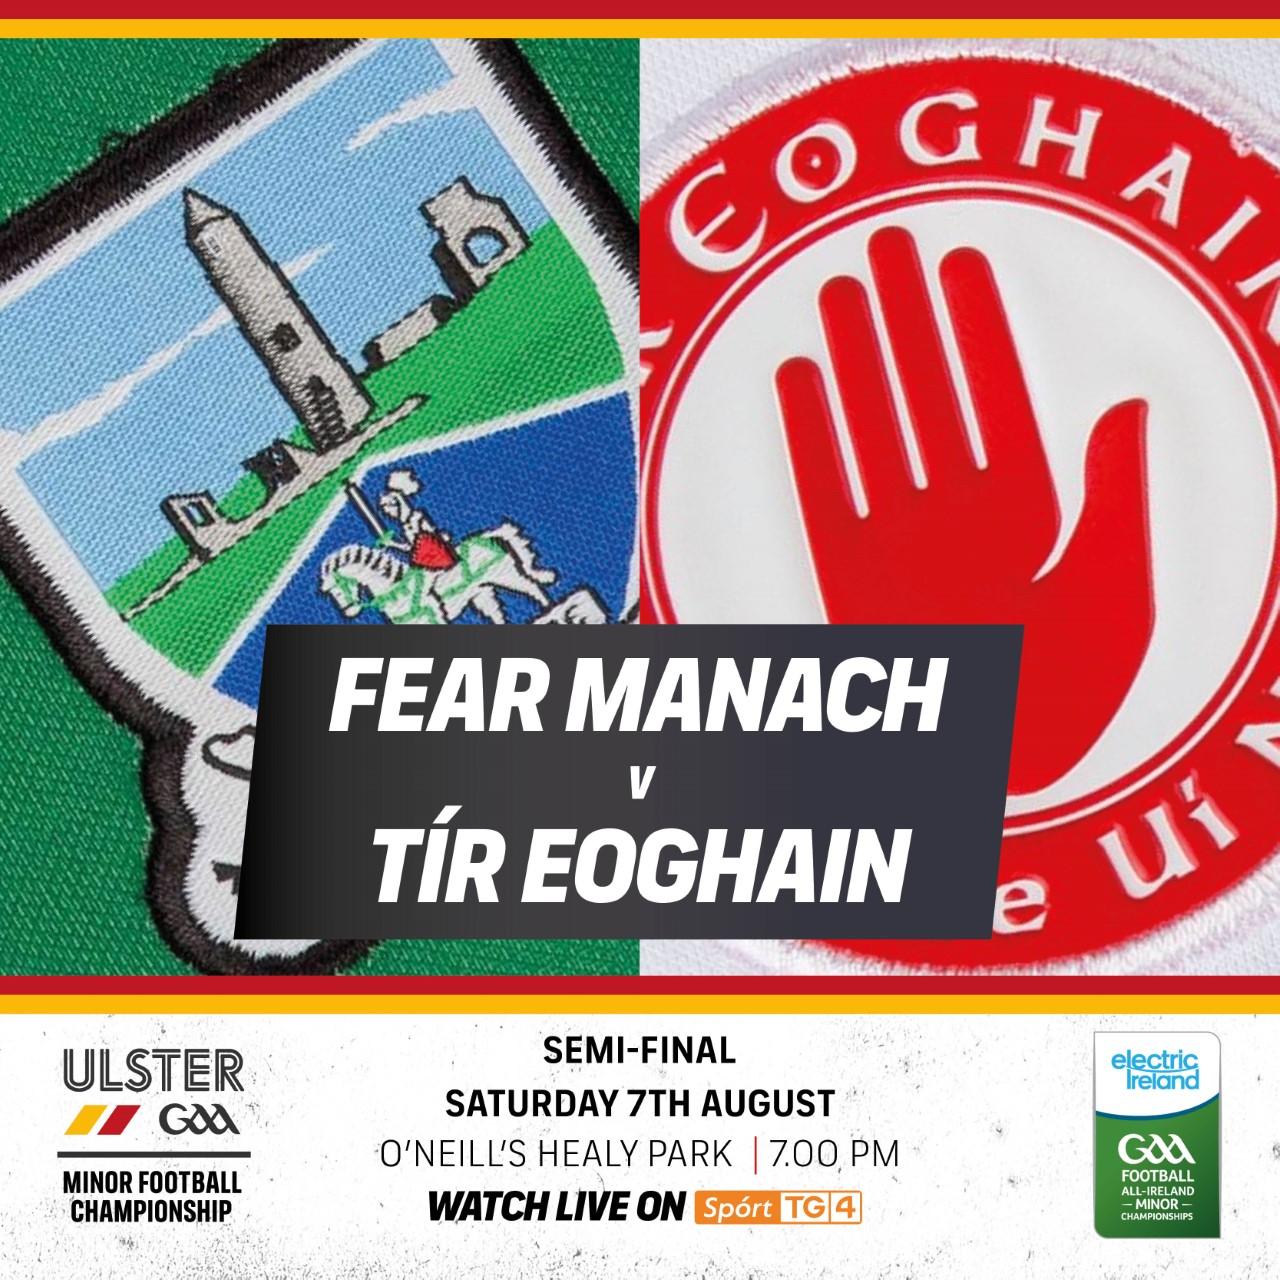 Electric Ireland Ulster Minor Football Championship Semi Final: Fermanagh v  Tyrone